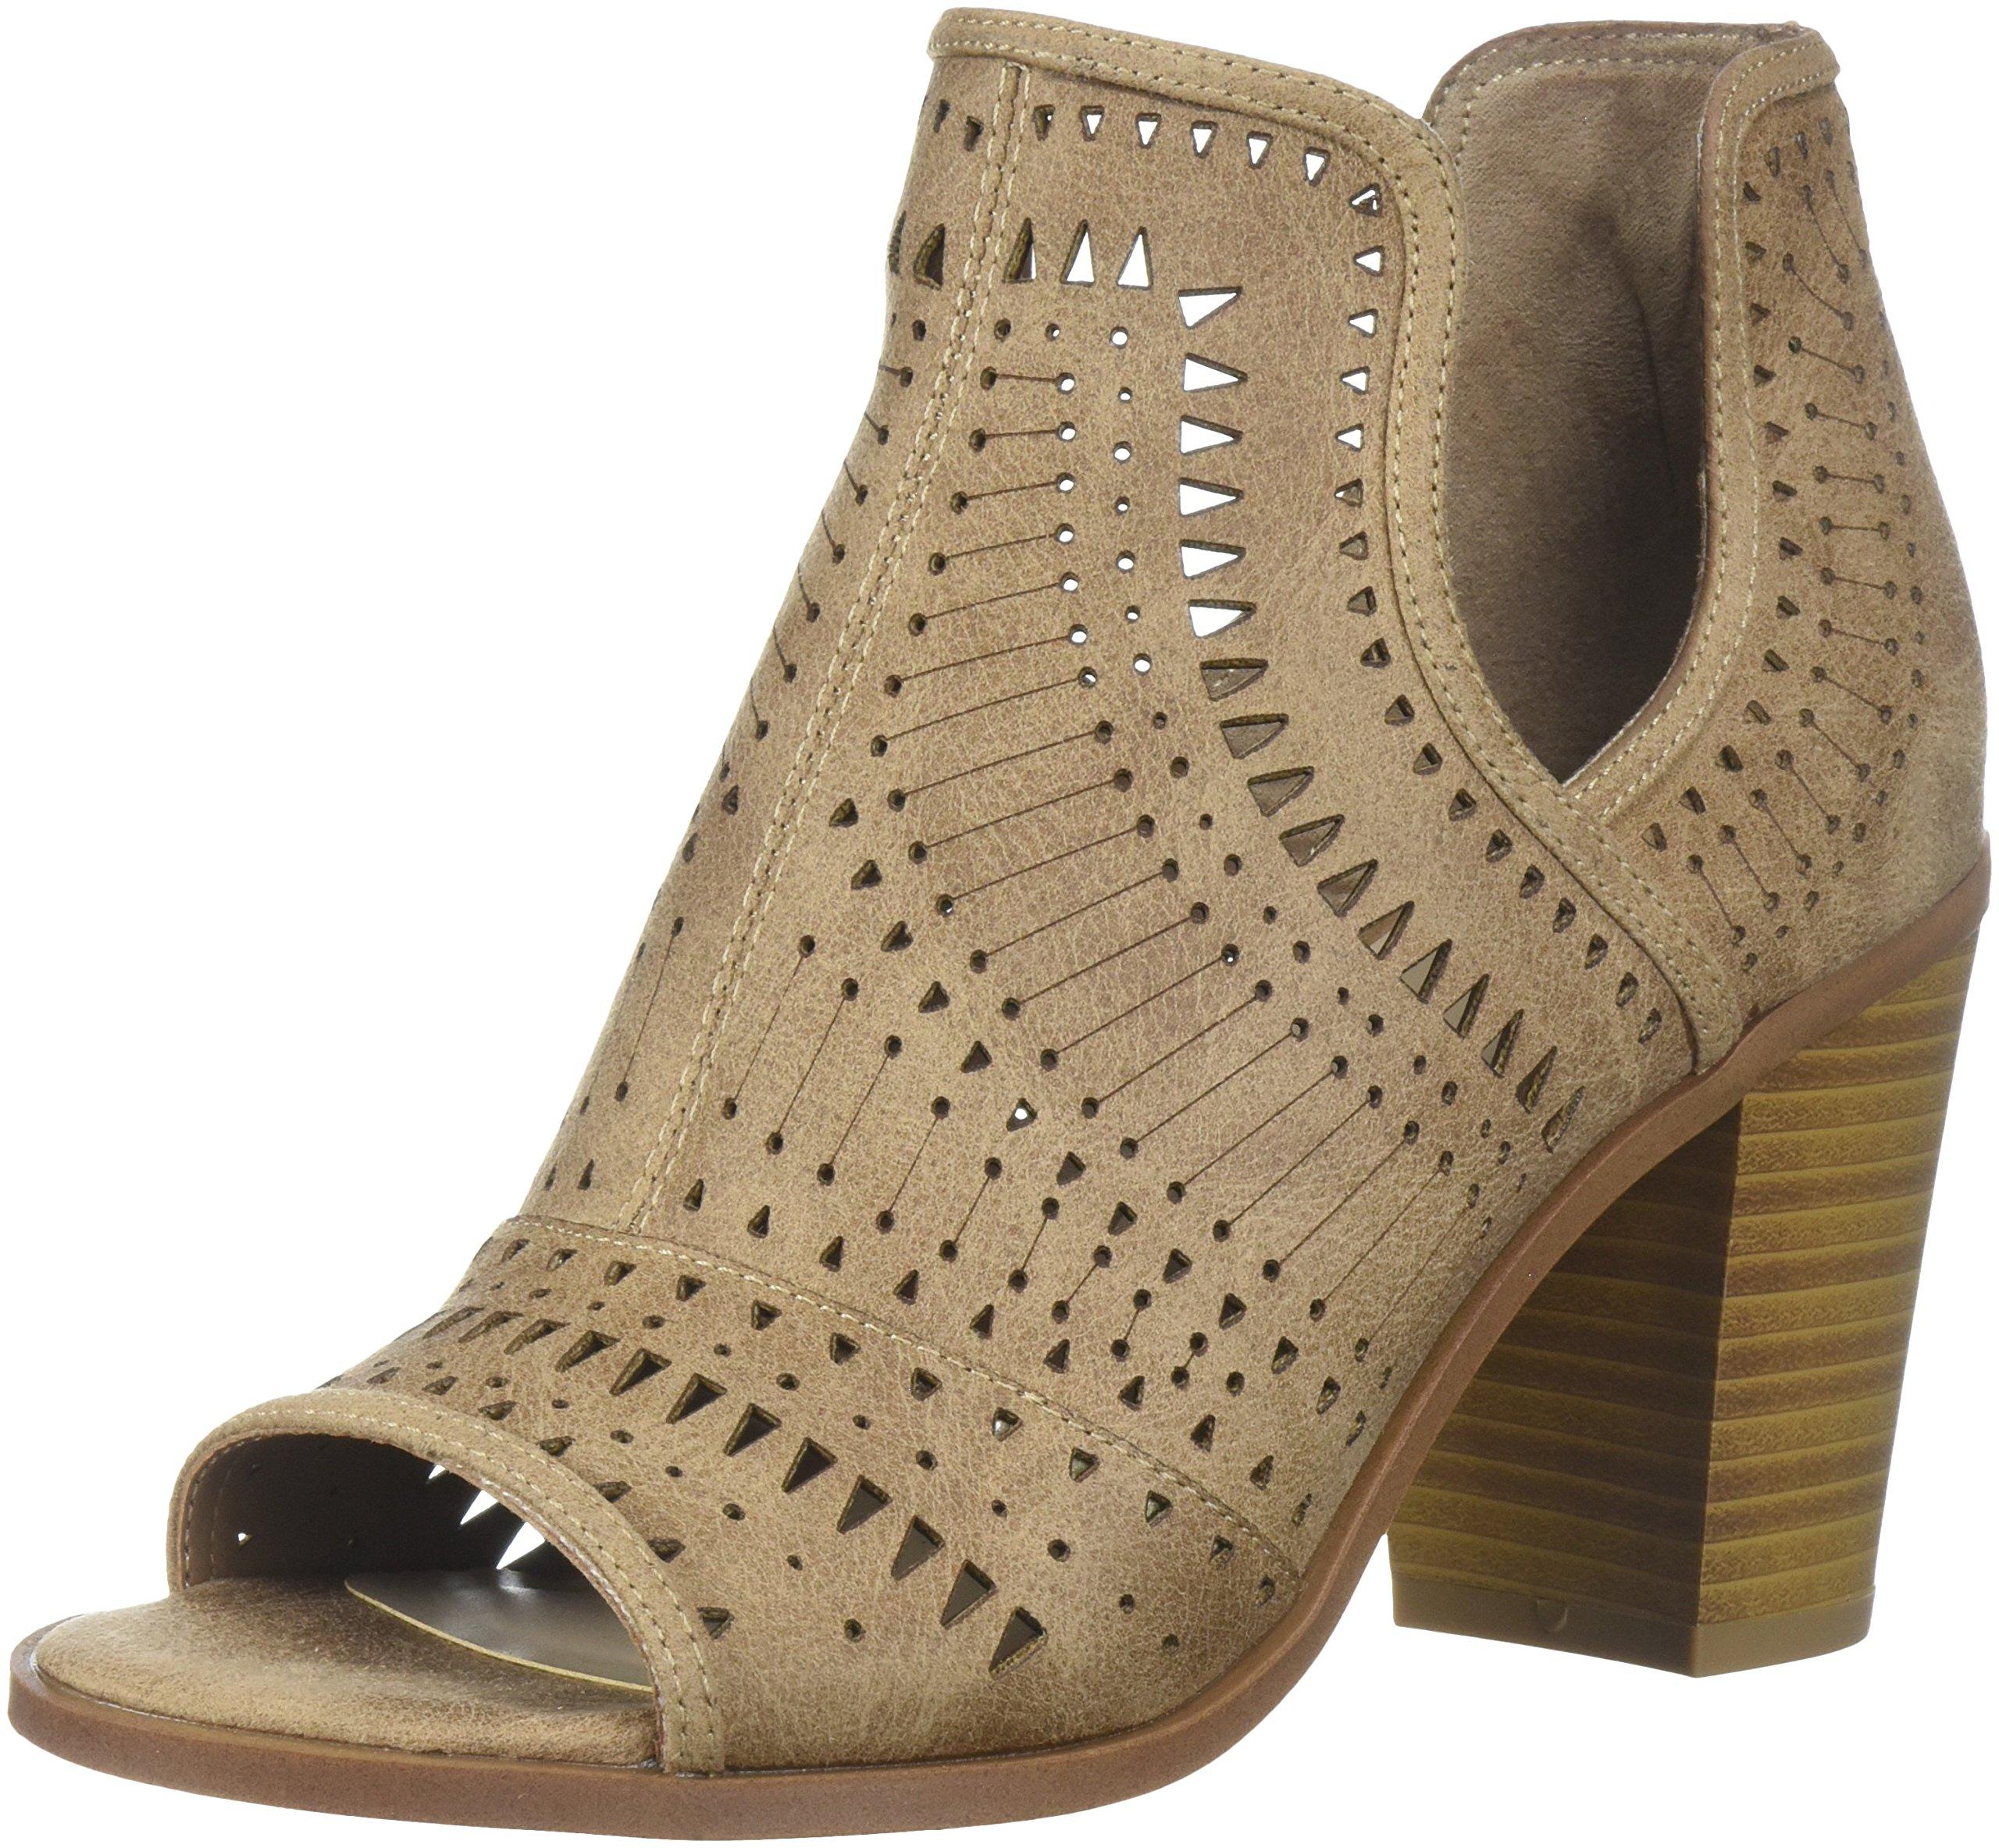 Fergalicious Women's Rattle Ankle Boot, Nude, 11 M US